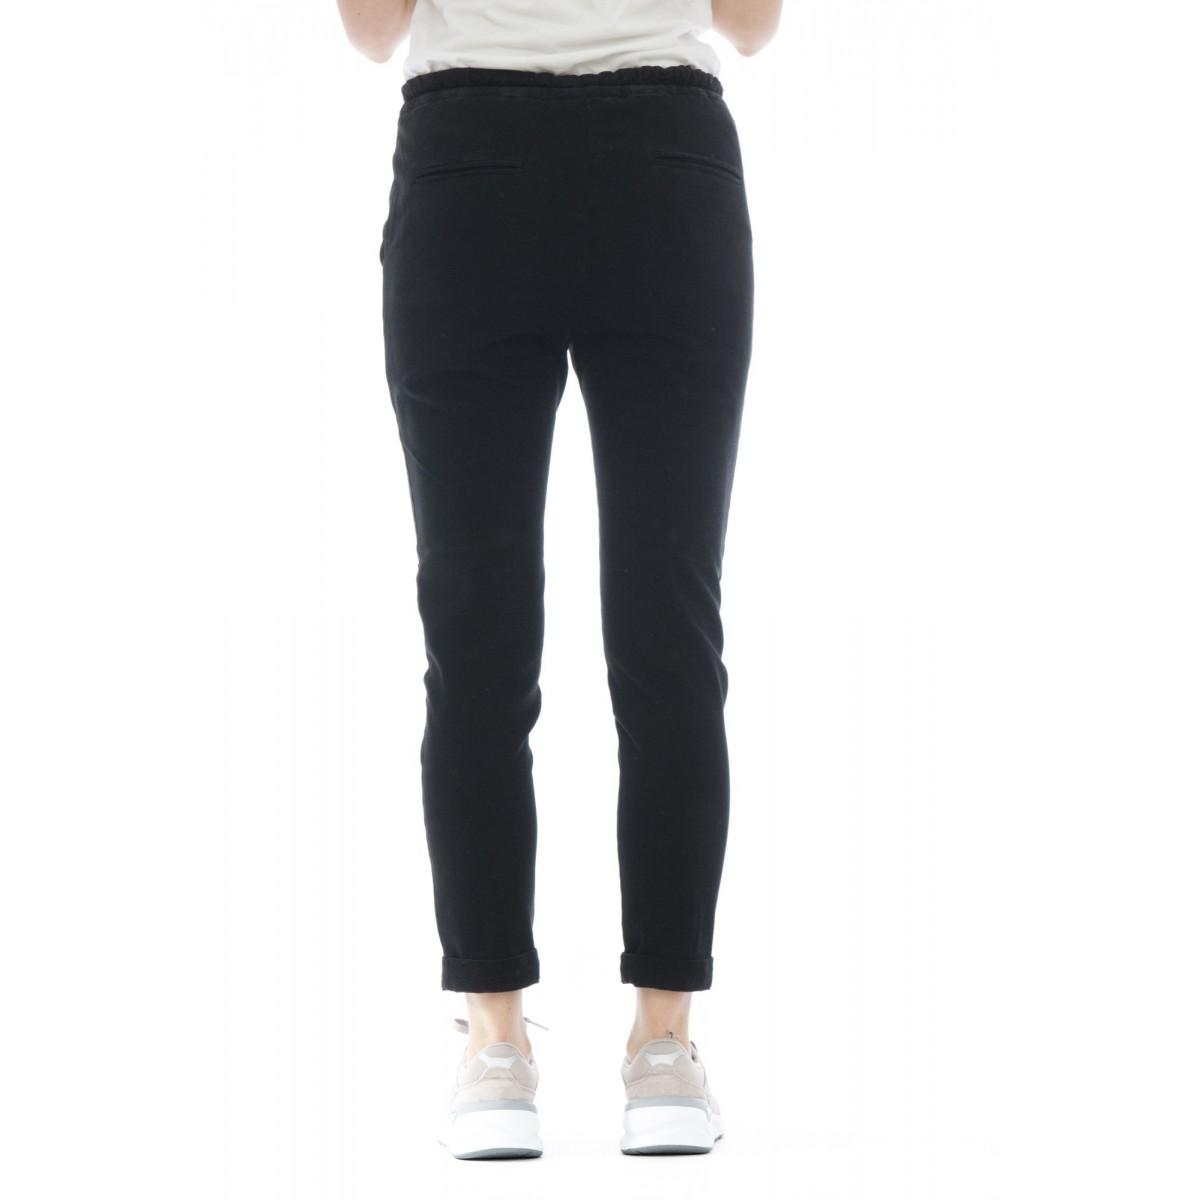 Pantalone donna - D04 gabardina tecnica strech